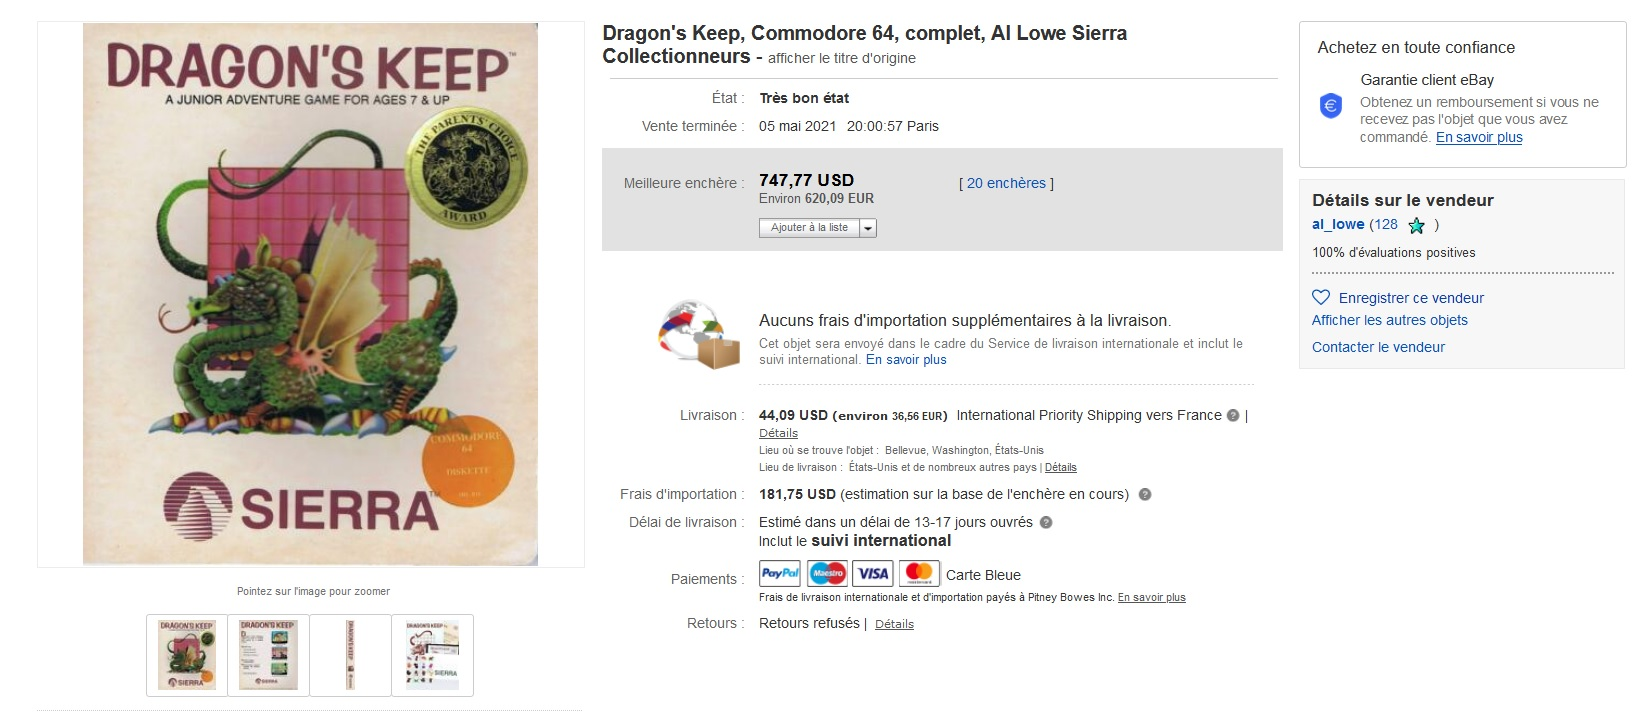 c64-dragon's-keep-sierra-01